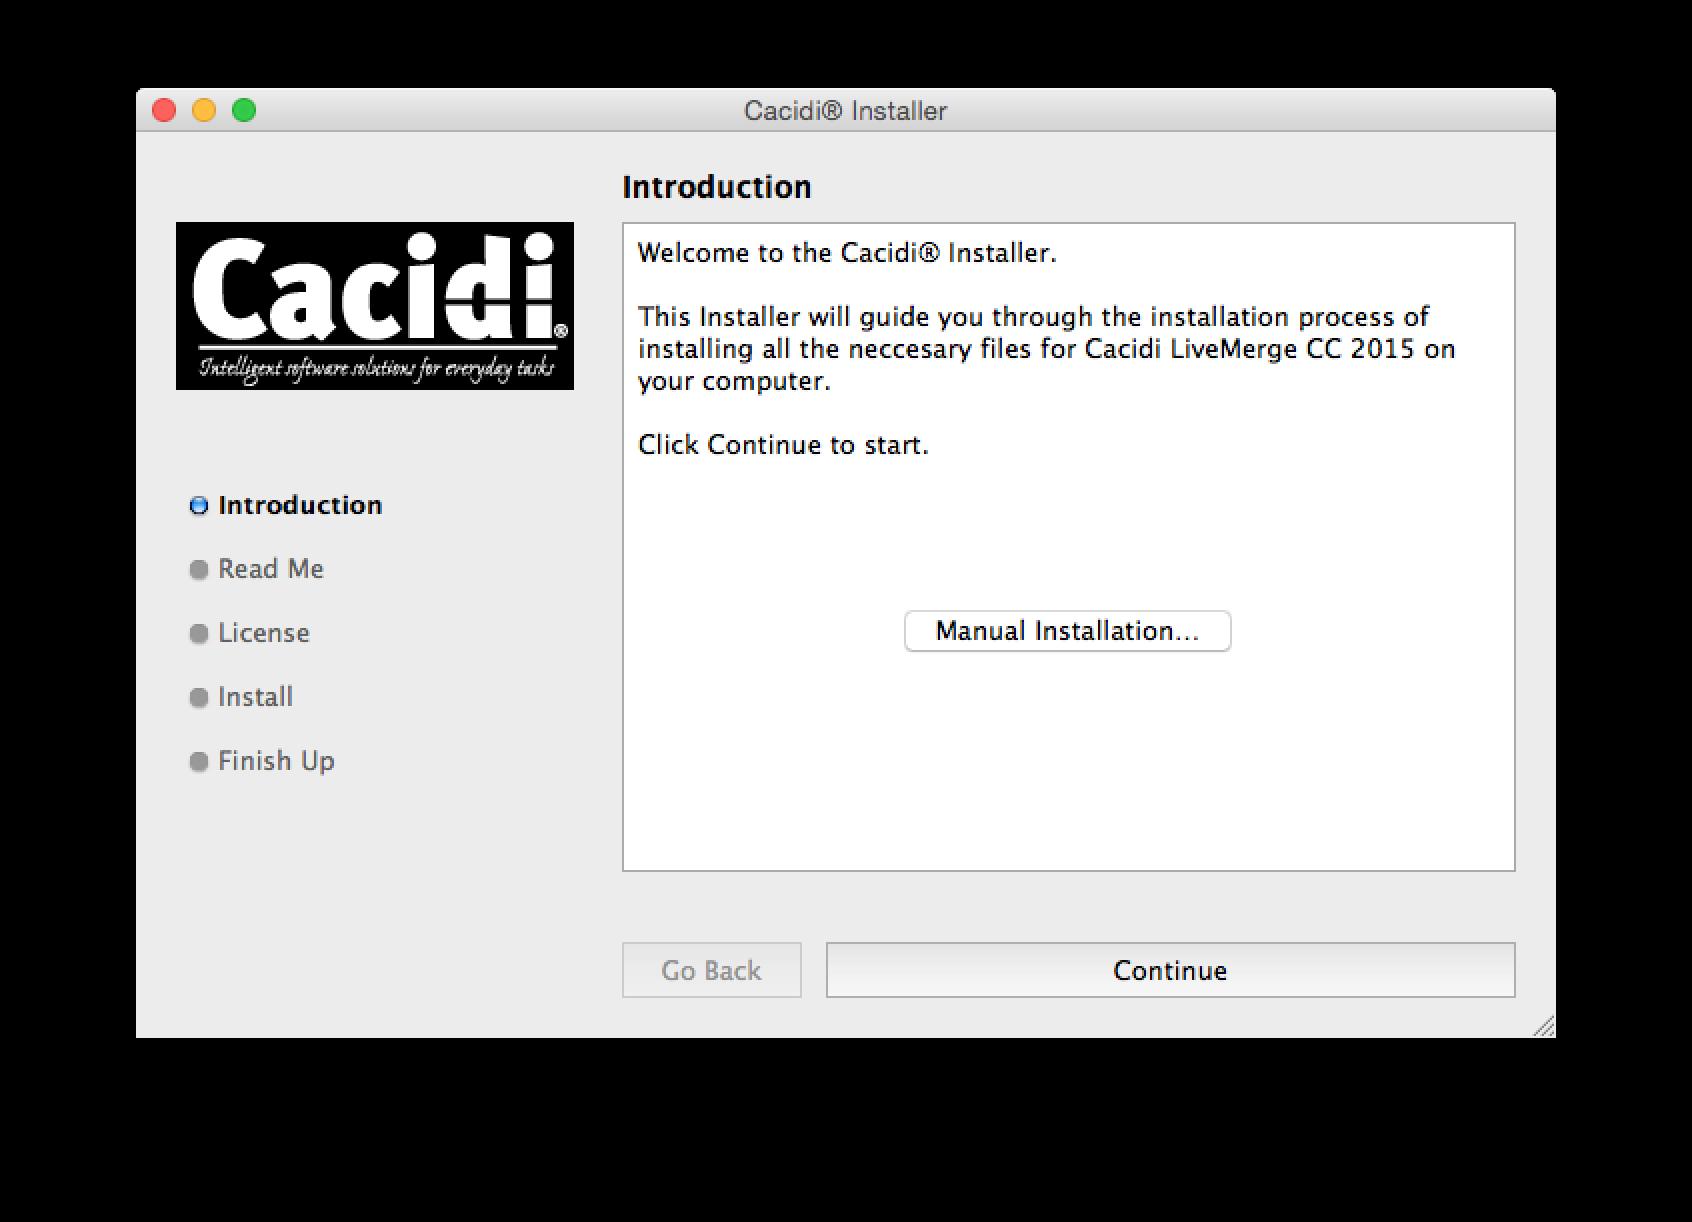 CacidiInst_A